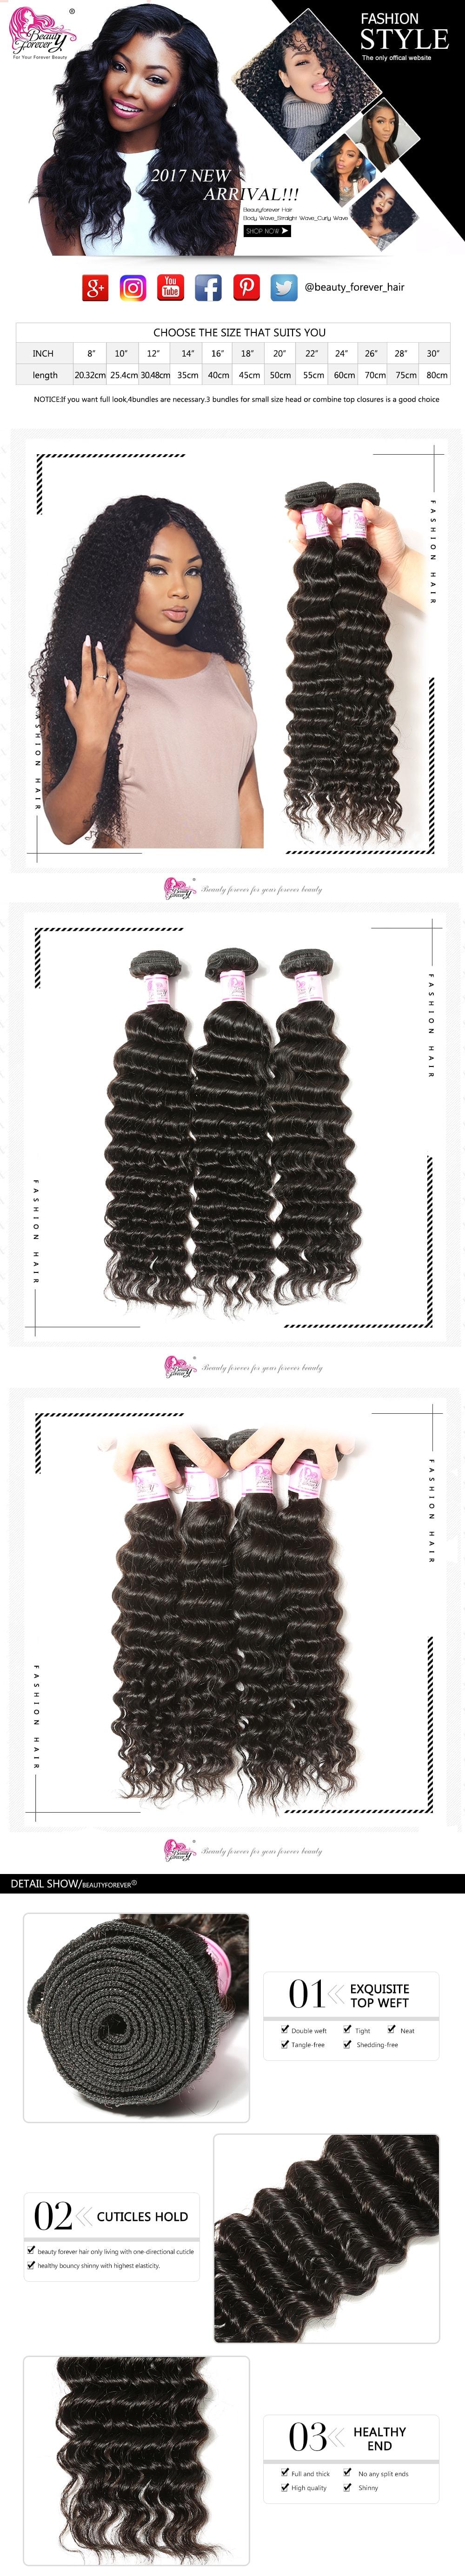 Virgin Indian Deep Wave Hair